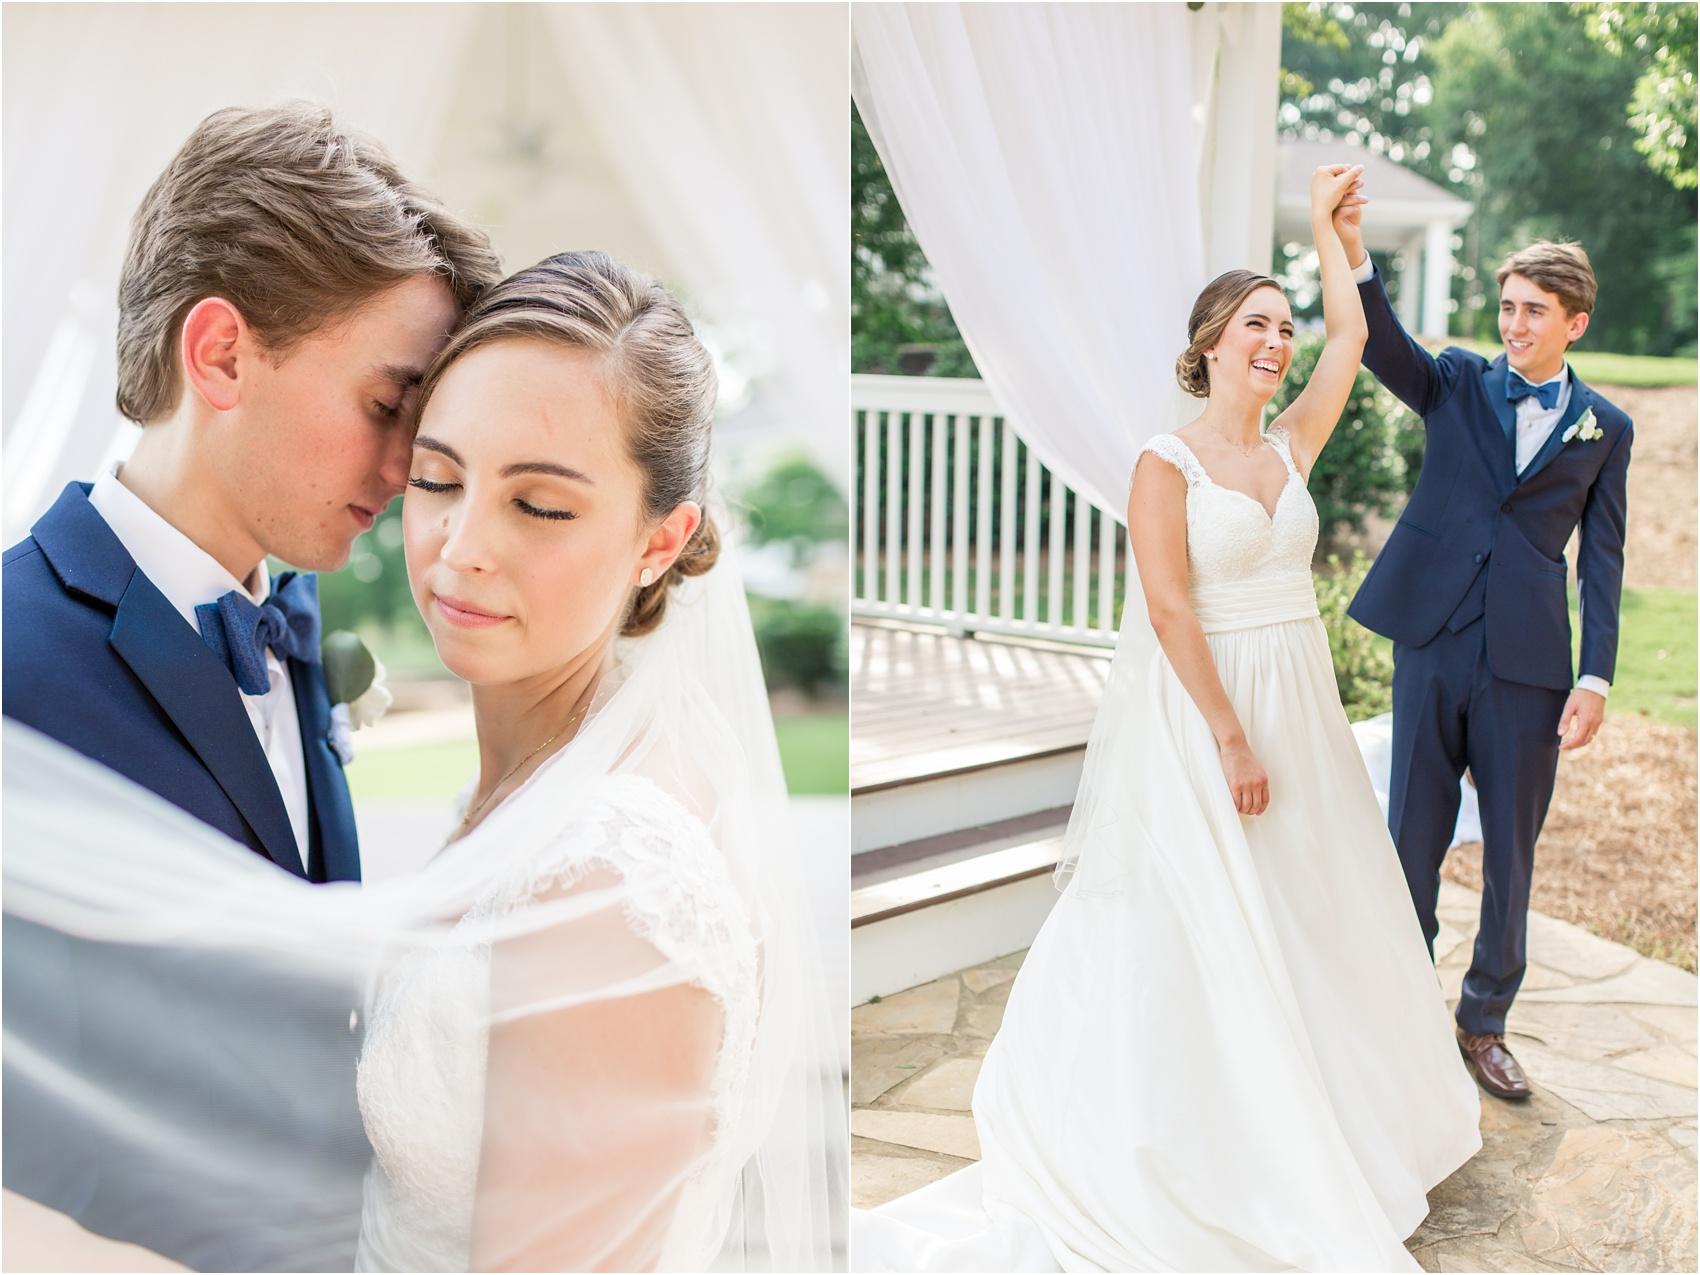 Savannah Eve Photography- Sigl-Adams Wedding- Sneak Peek-52.jpg